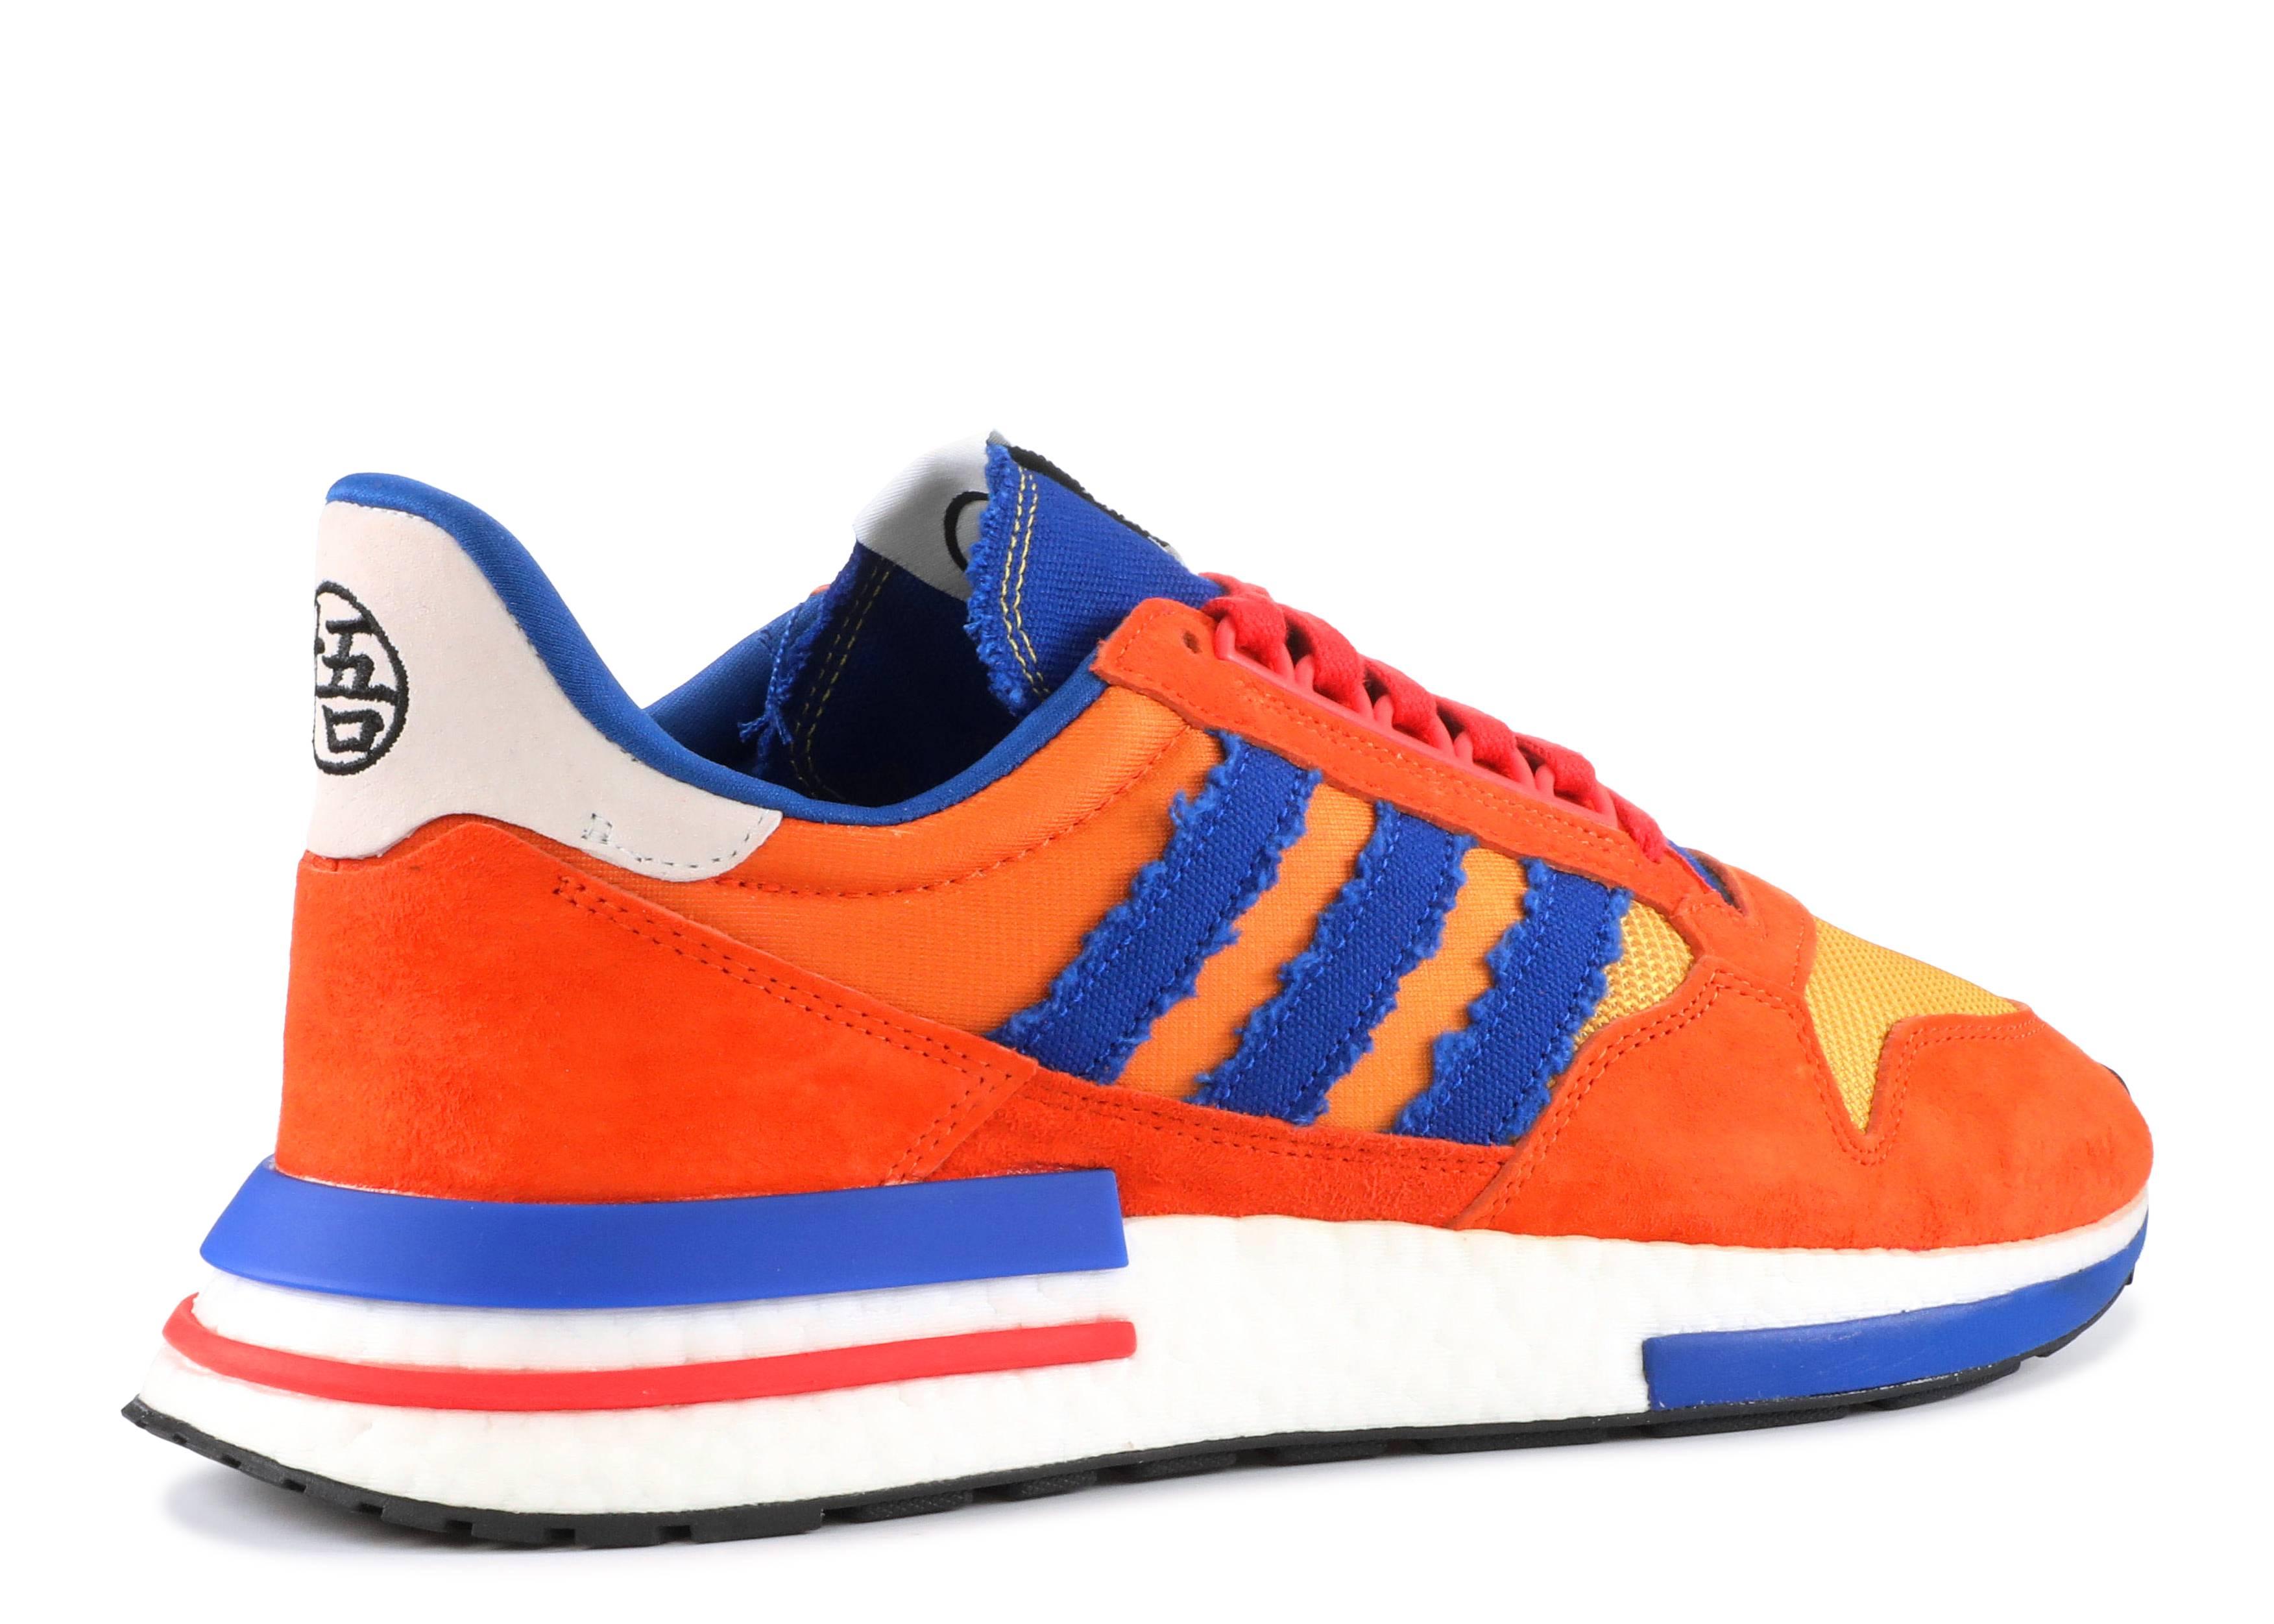 adidas zx 500 kopen